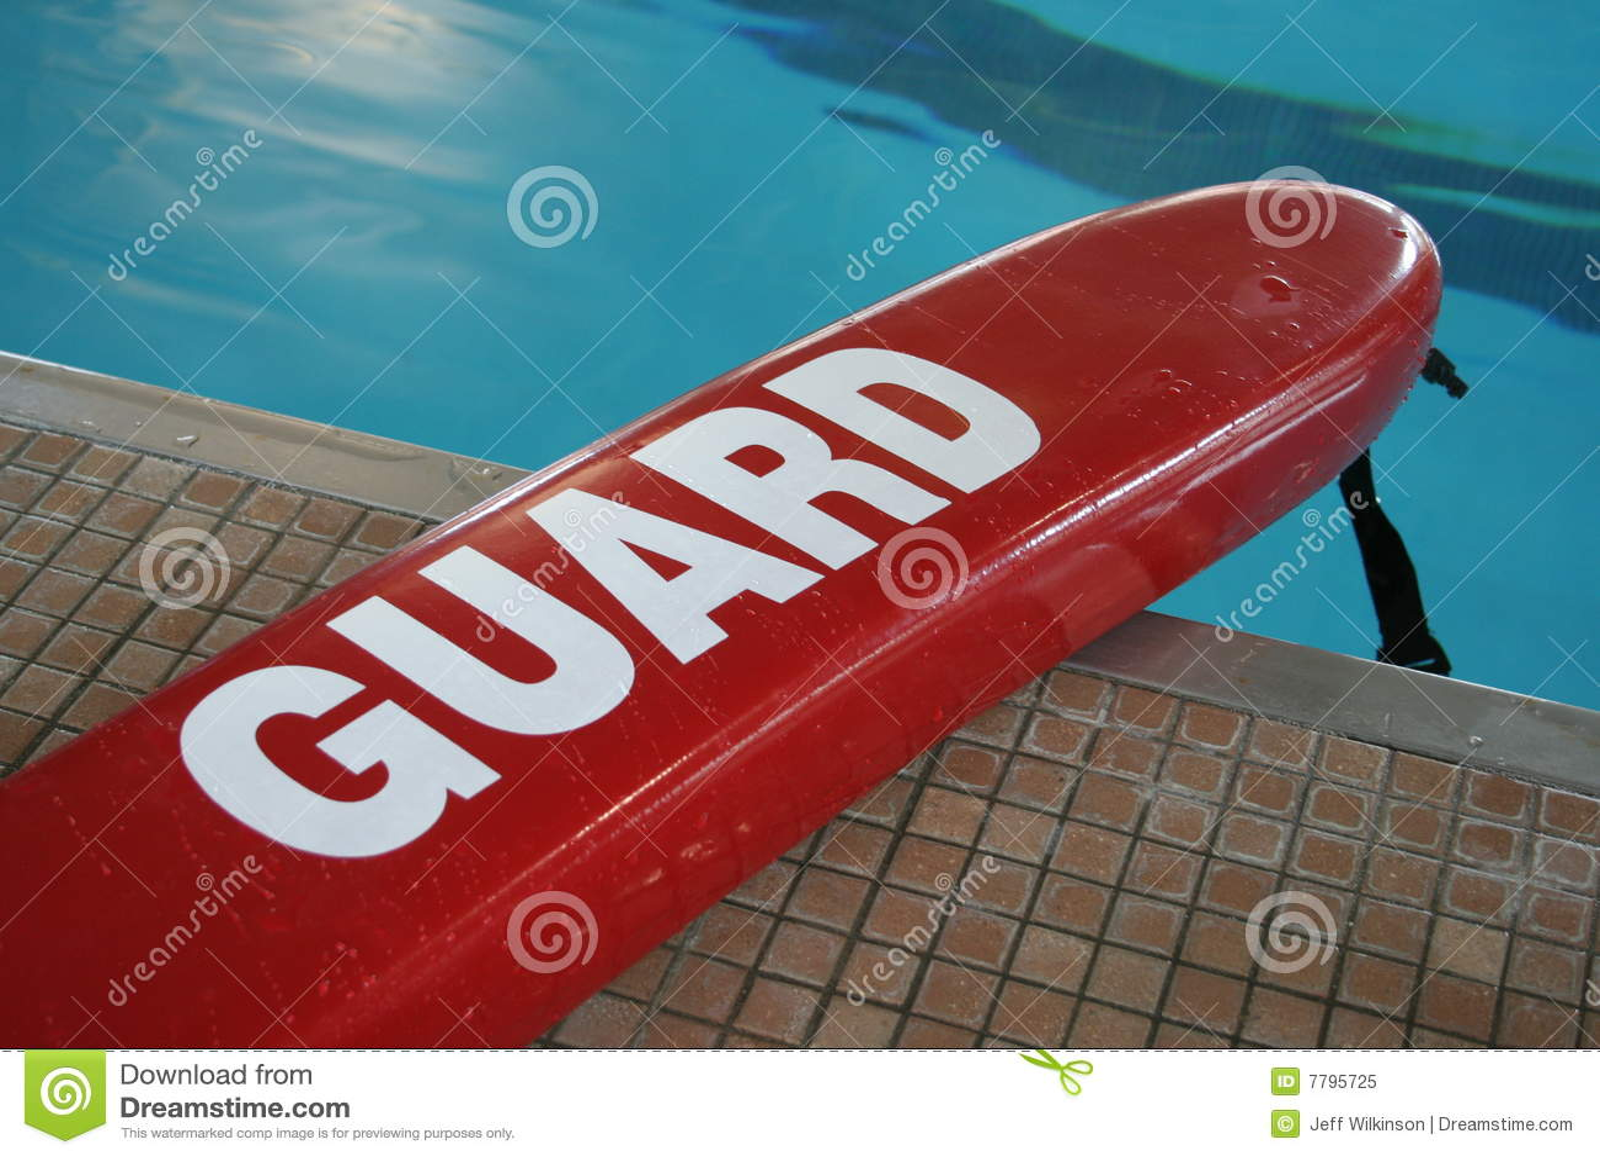 Flotador salvavidas de la piscina foto de archivo libre de for Salvavidas para piscinas